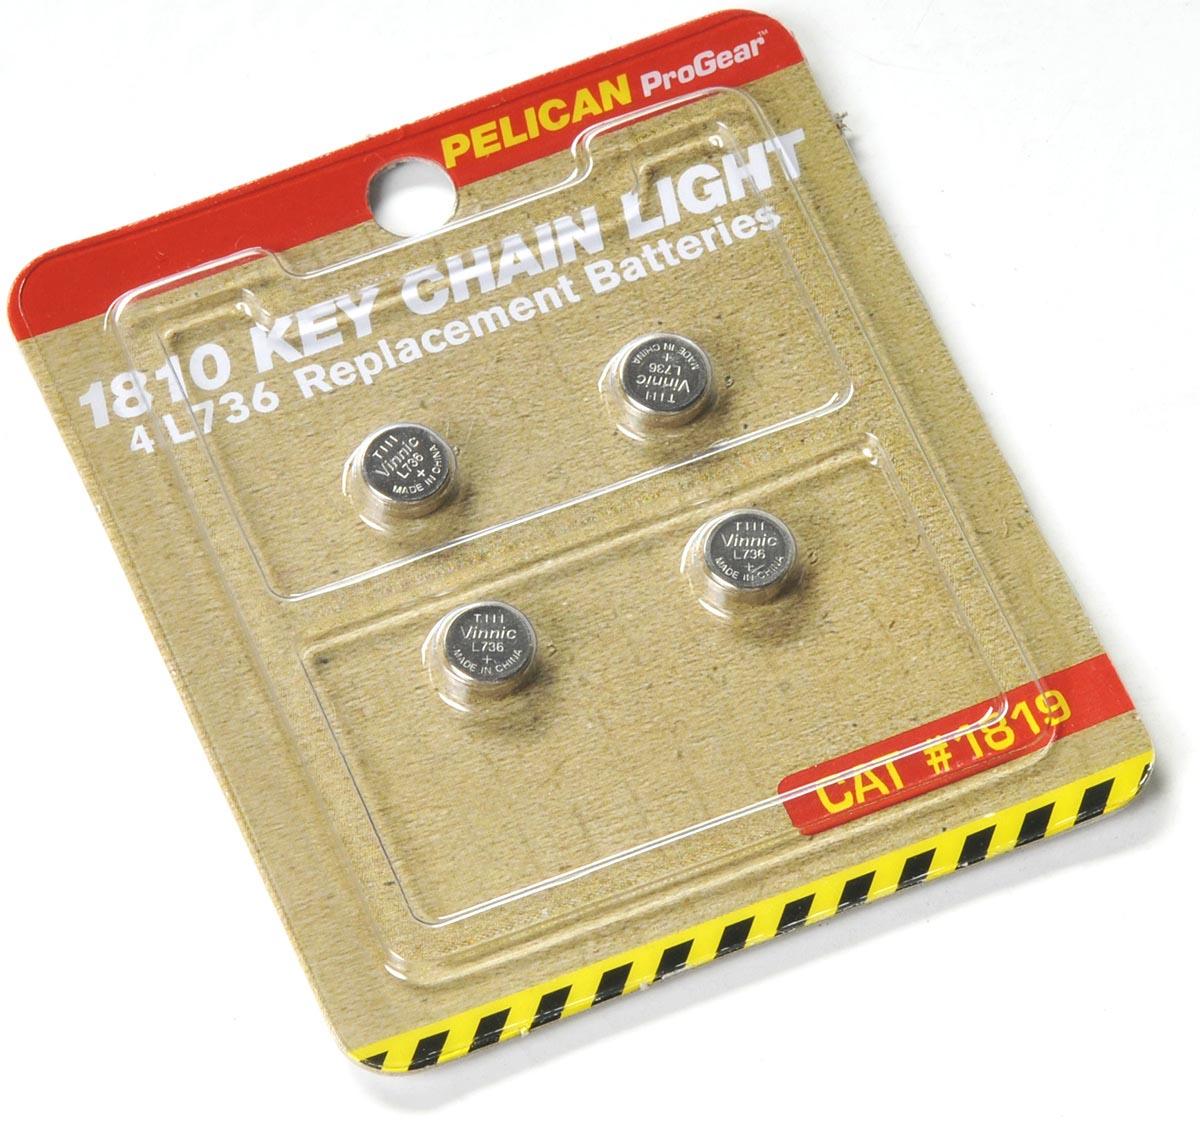 pelican 1810 replacement batteries flashlight